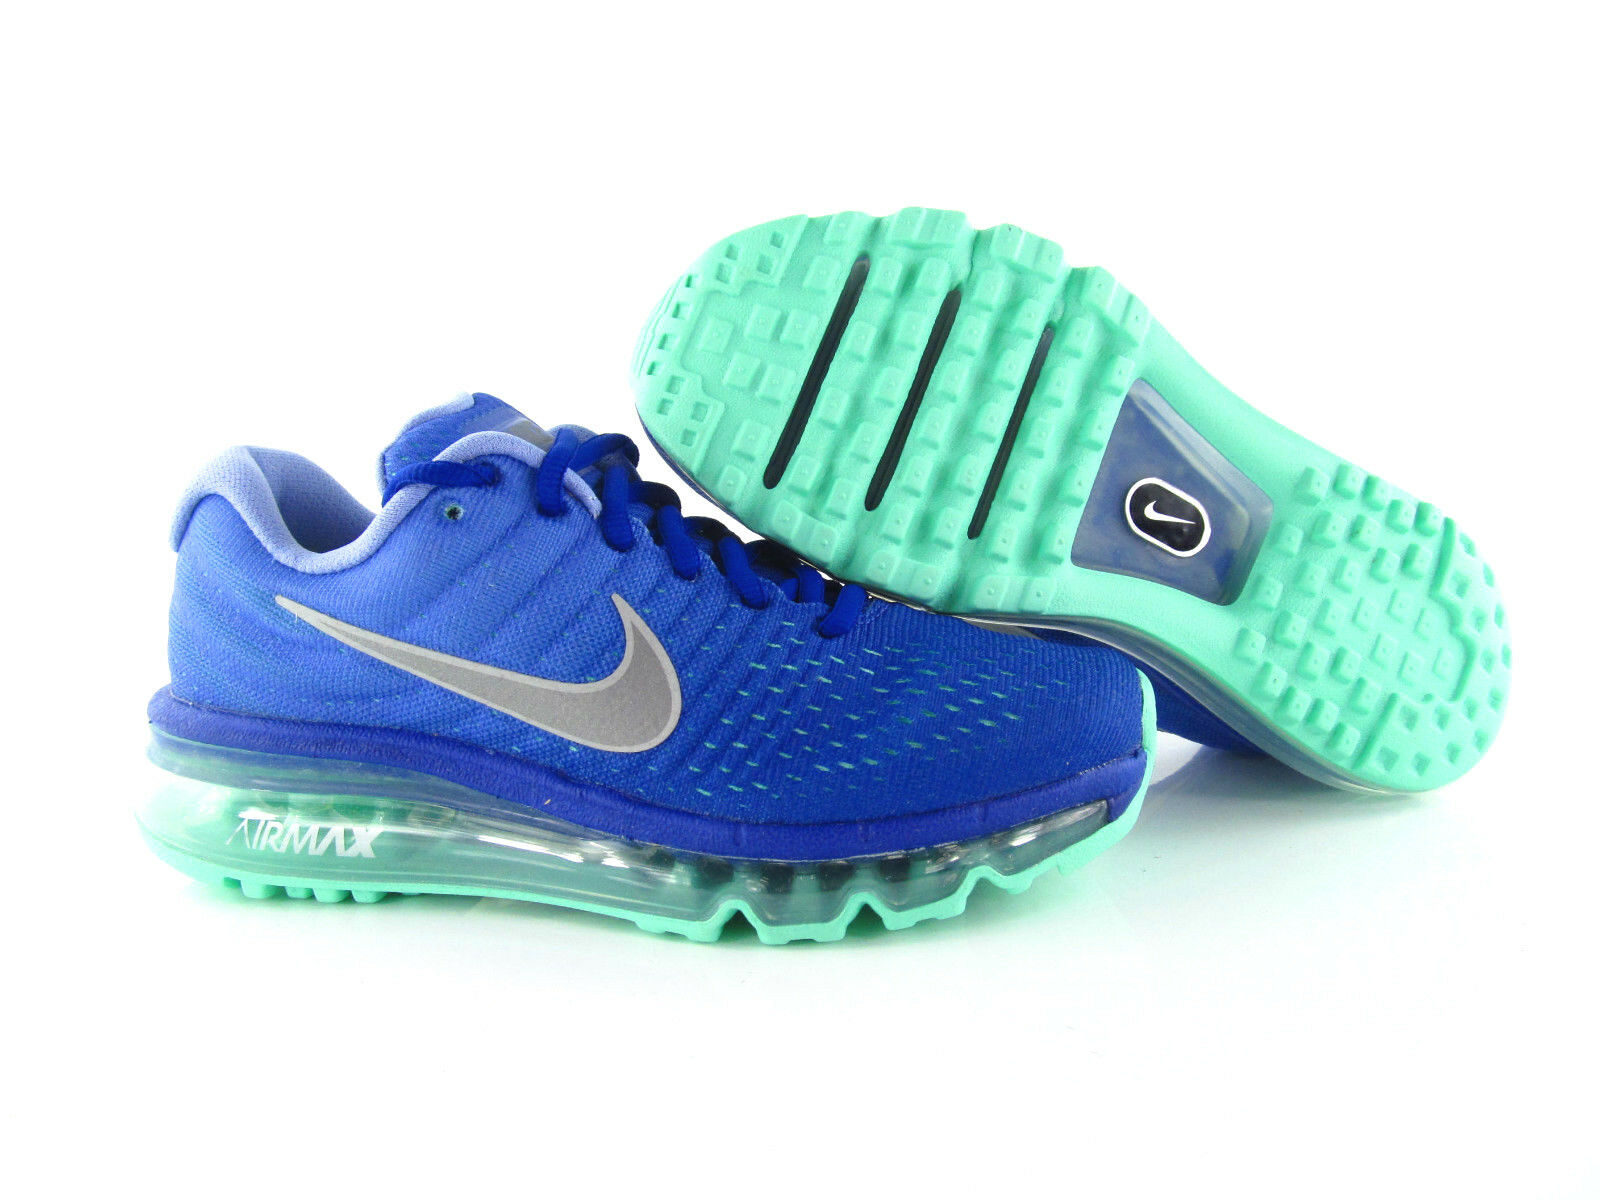 Nike Air Max 2017  Sneakers Running Lila Eur Grün New US_6 UK_3.5 Eur Lila 36.5 6a06d9